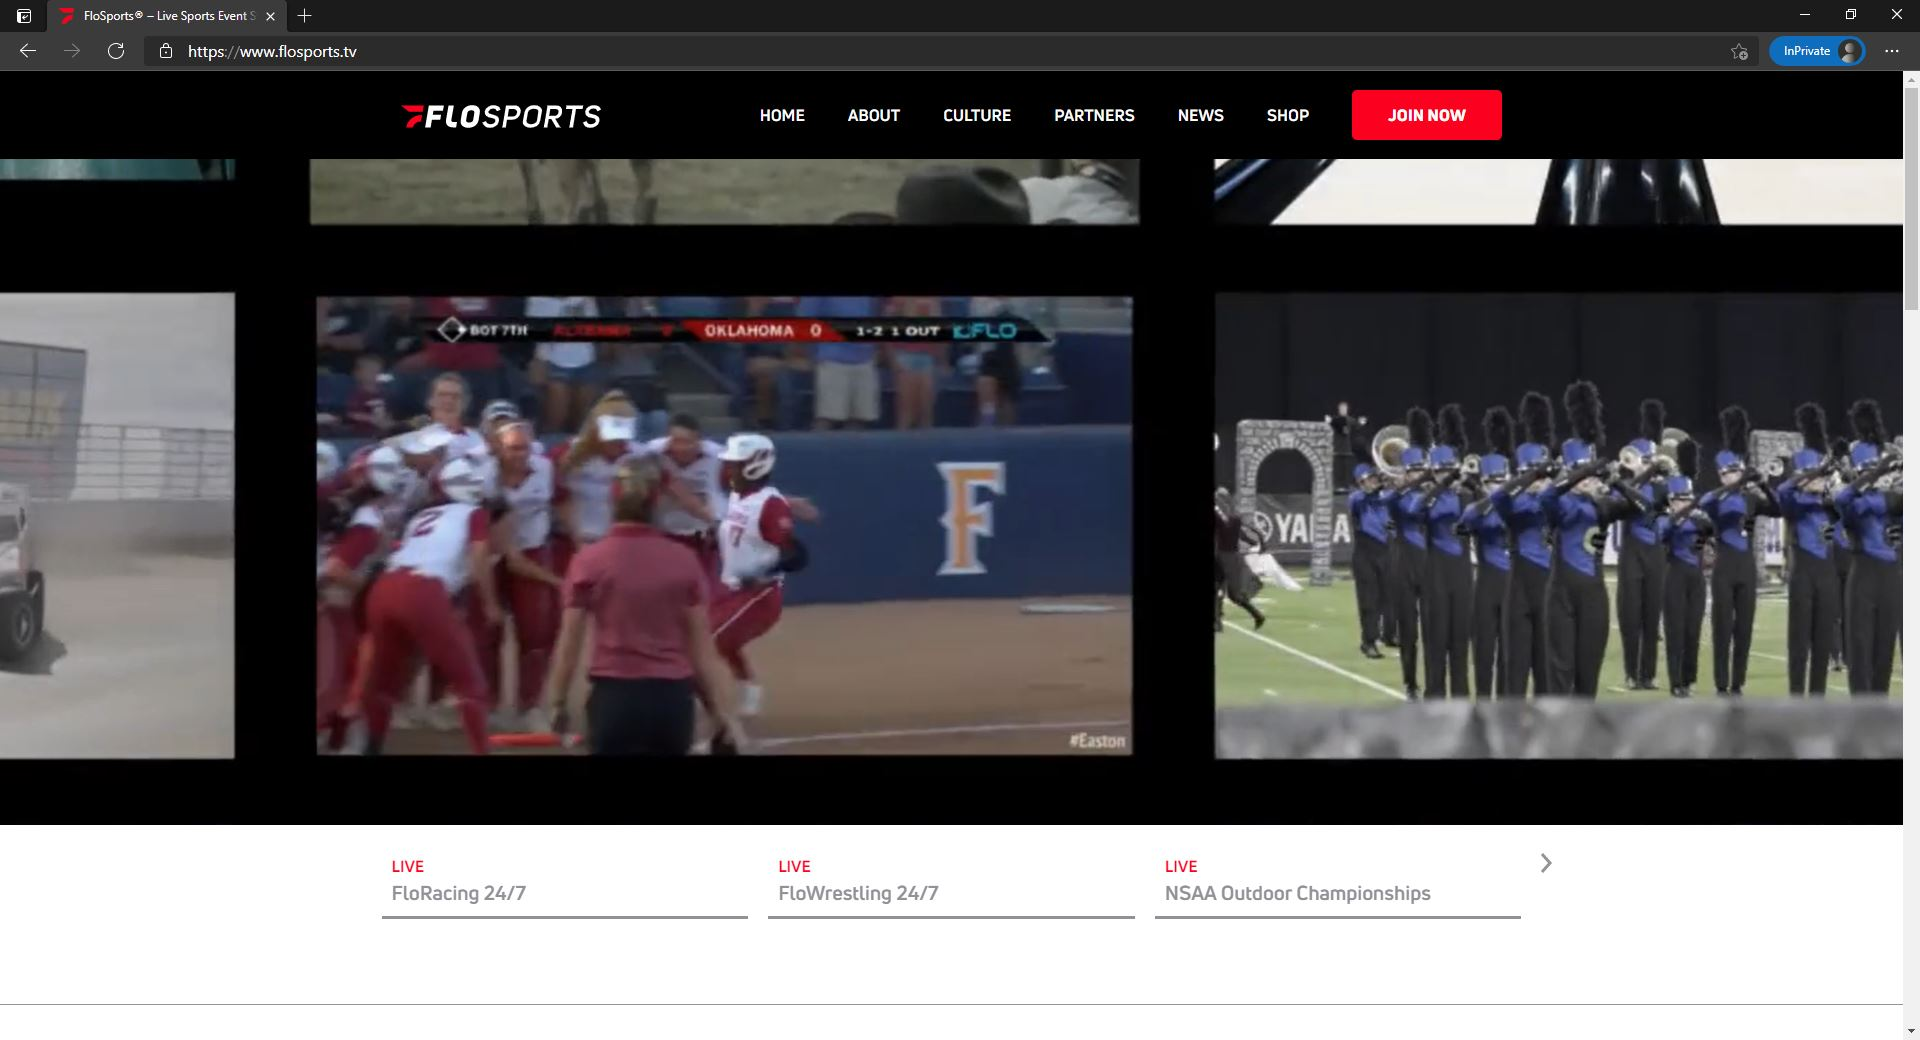 FloSports website homepage